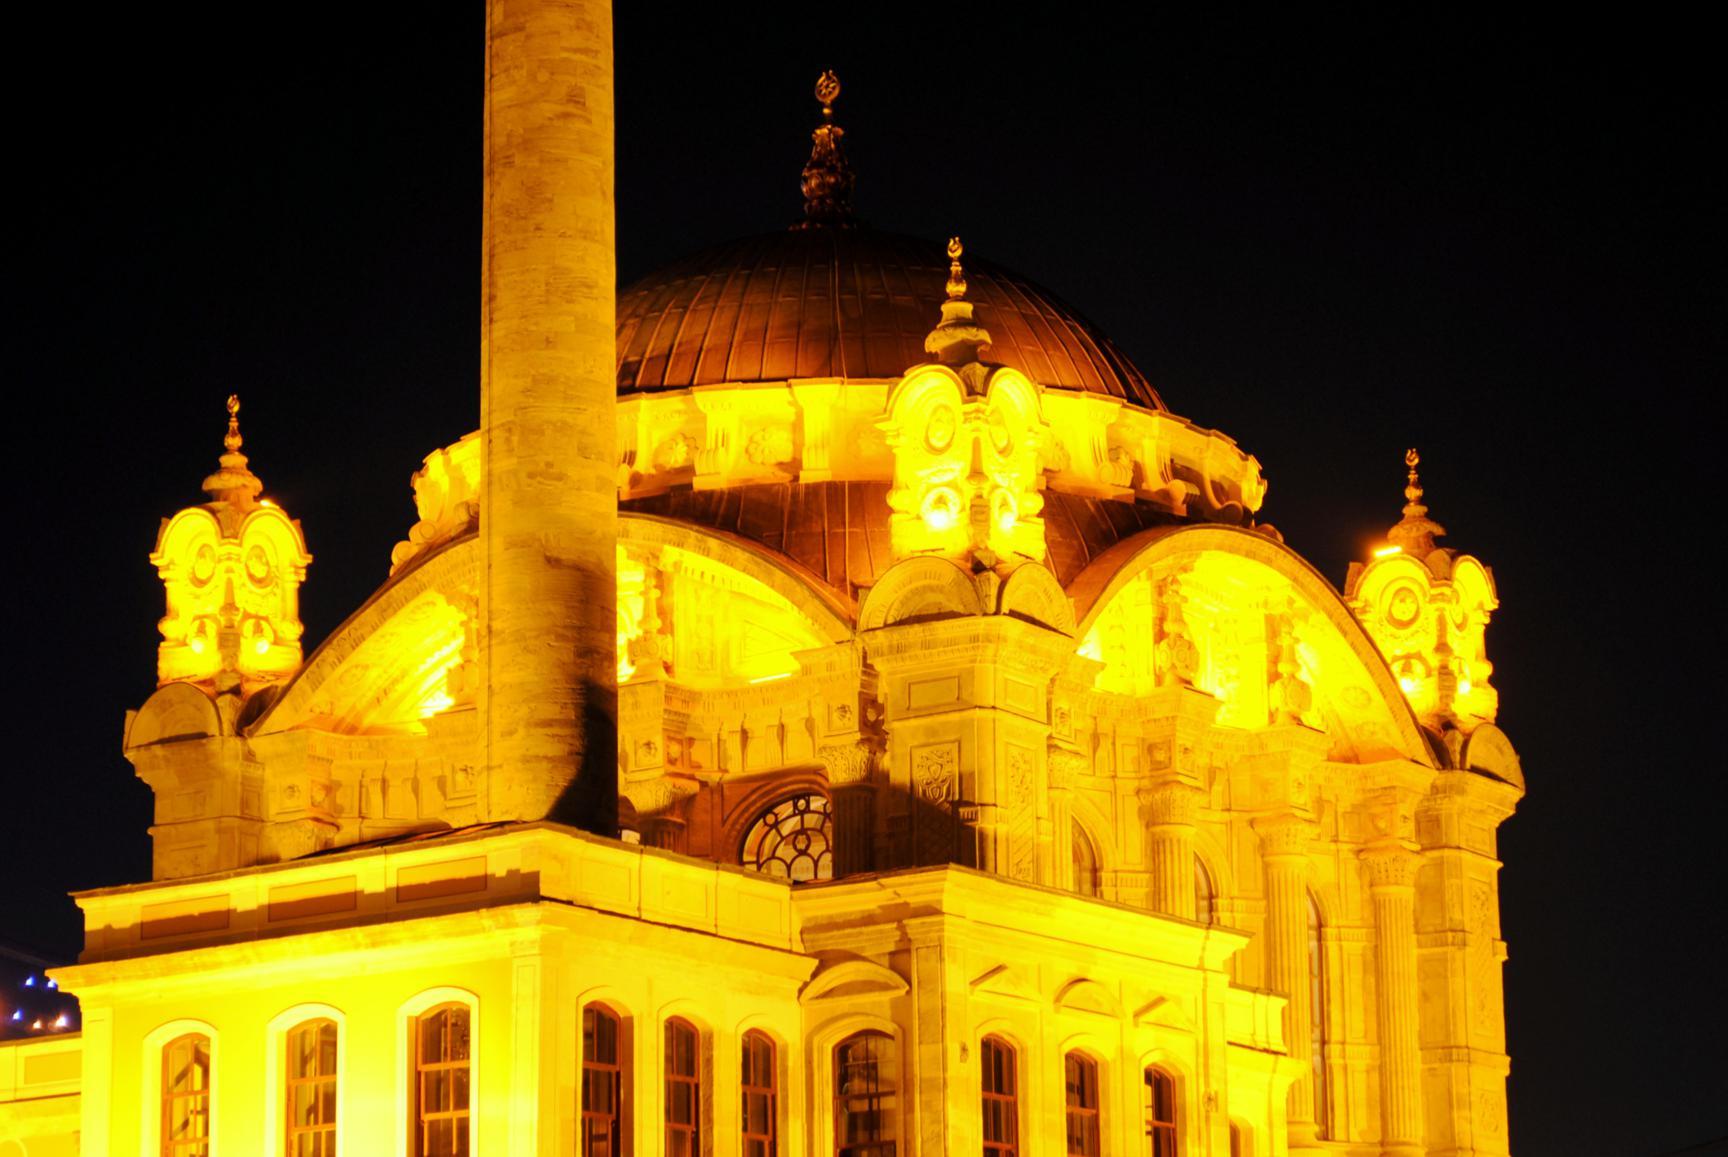 mezquita-ortakoy-4